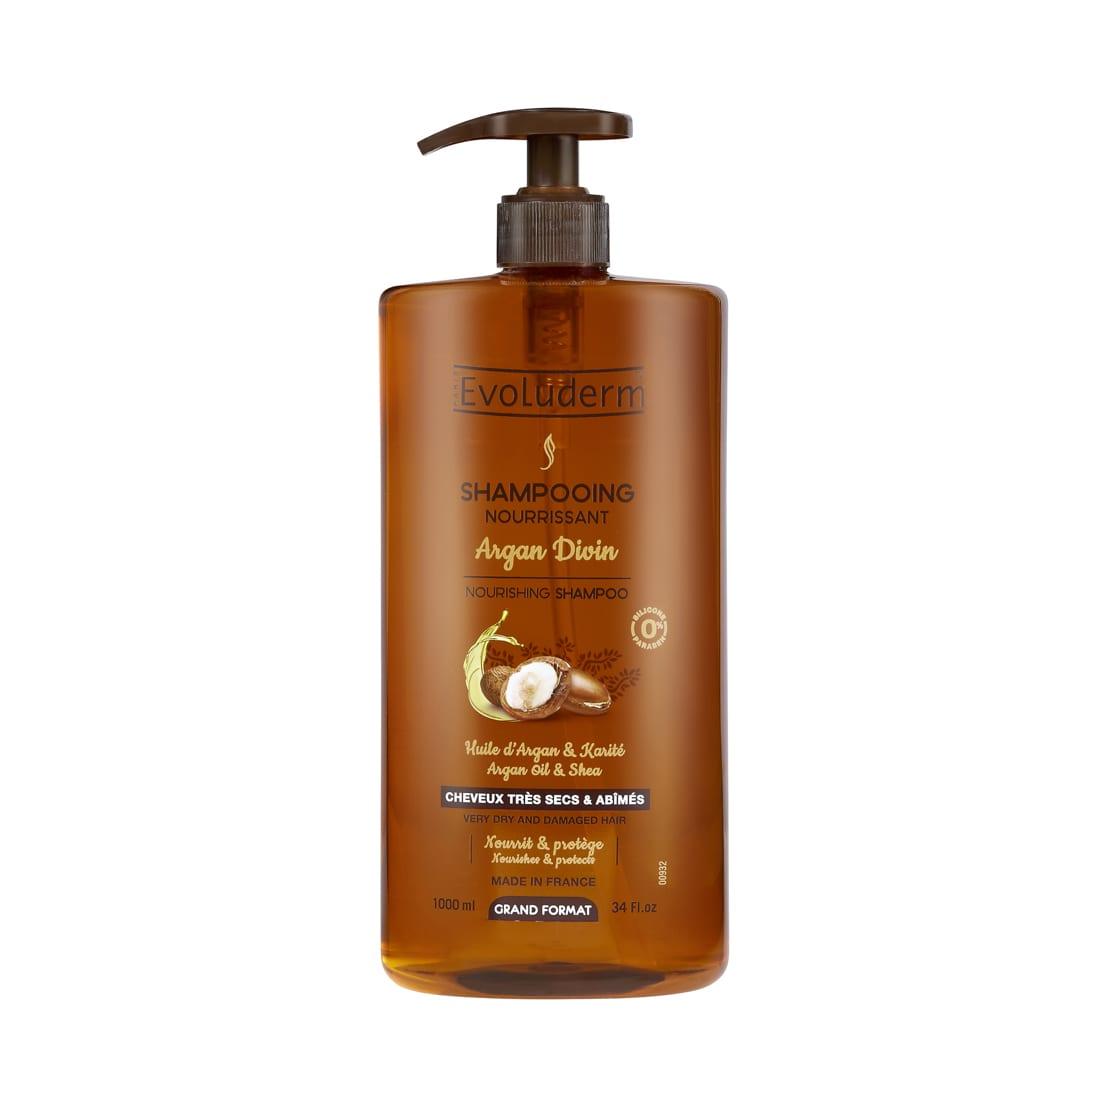 Argan Divin Shampoo 1lt